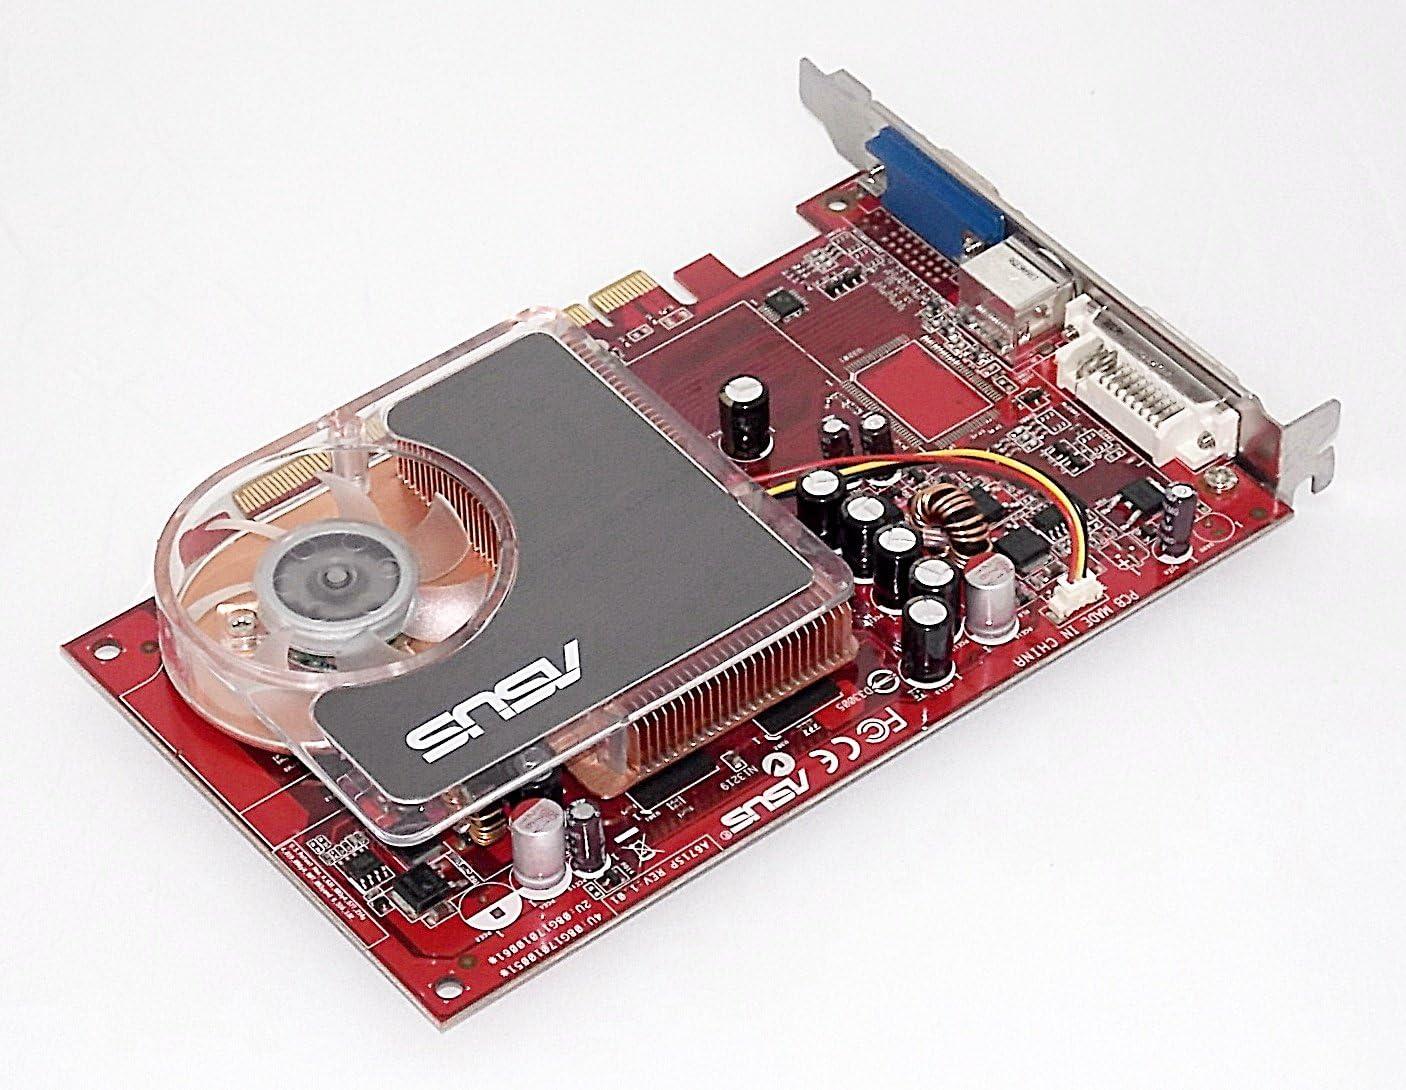 ASUS EAX1650PRO Gamer Edition//HTD//256M//A RADEON X1650PRO 256MB PCI-E x16 DVI HDTV Video Card